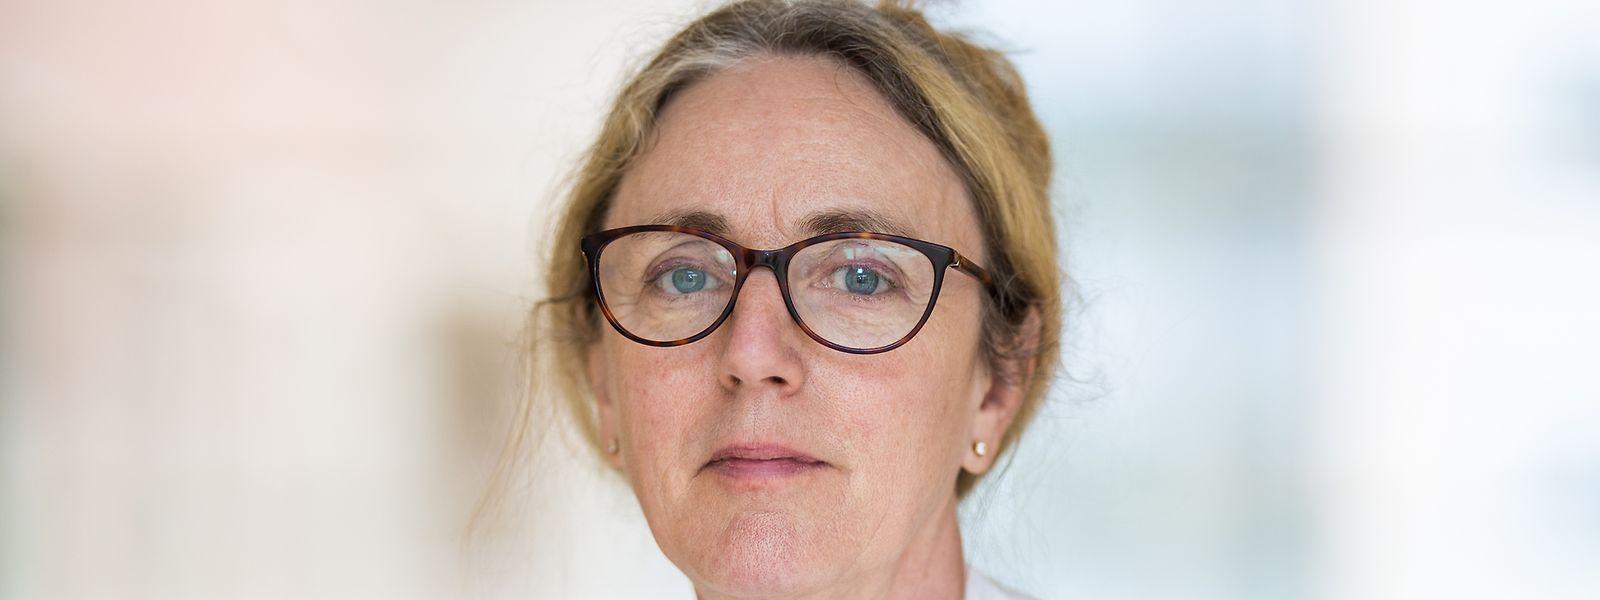 Dr Thérèse Staub